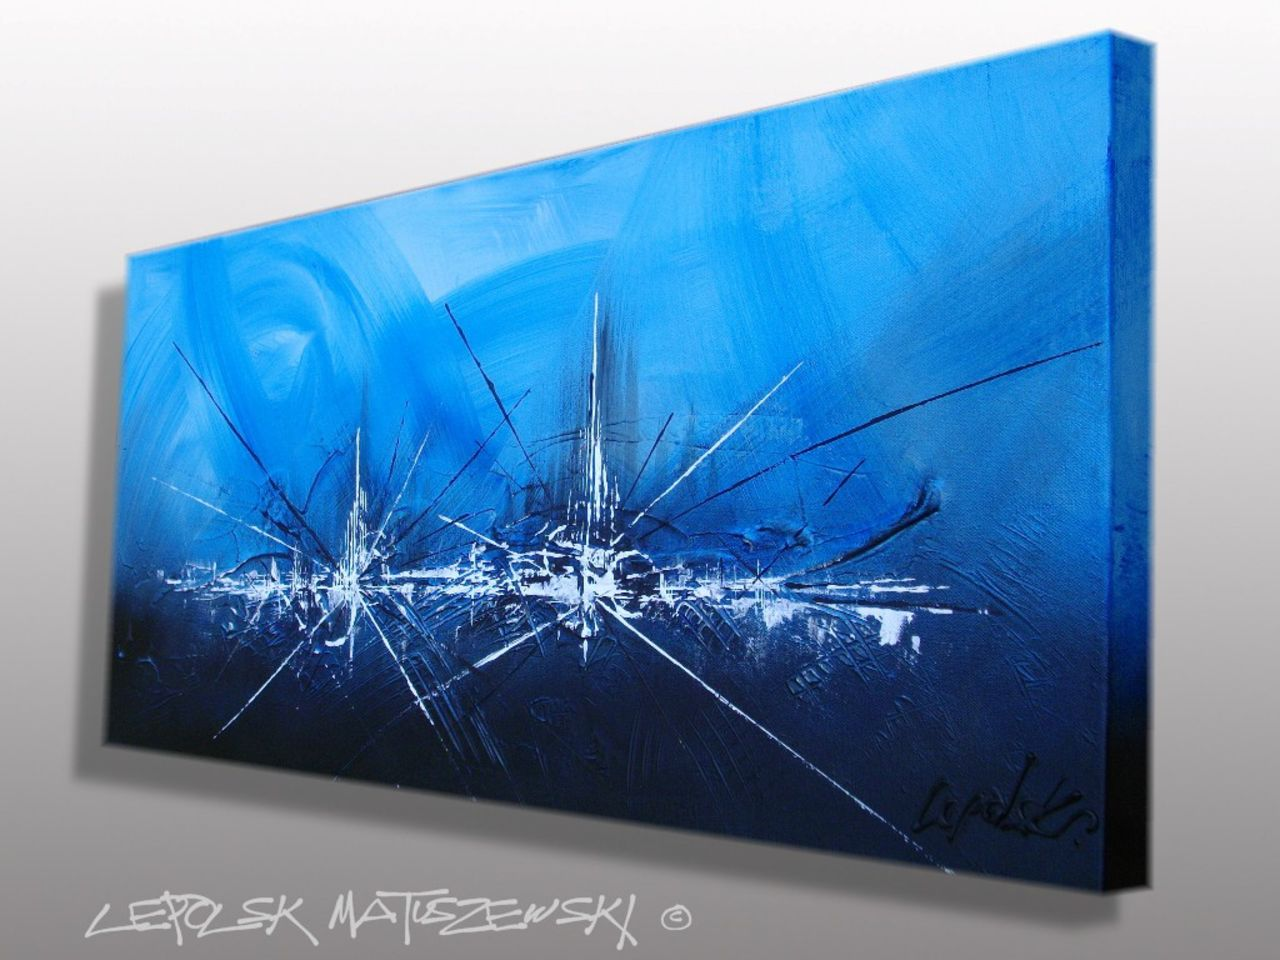 MISTER K  (Lepolsk Matuszewski)  DEEP BLUE